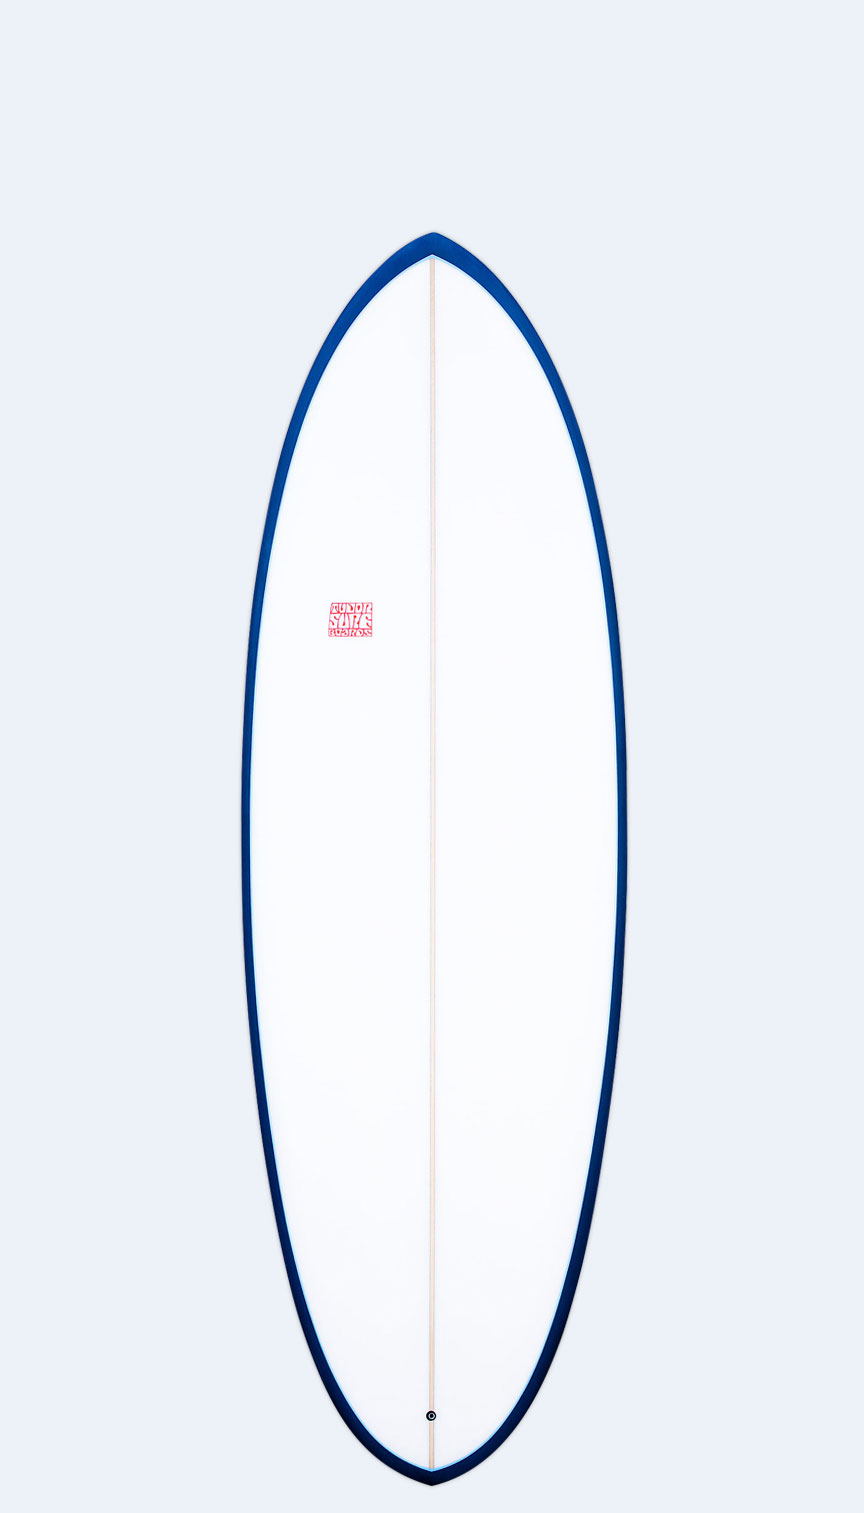 tudor-surfboards-karma